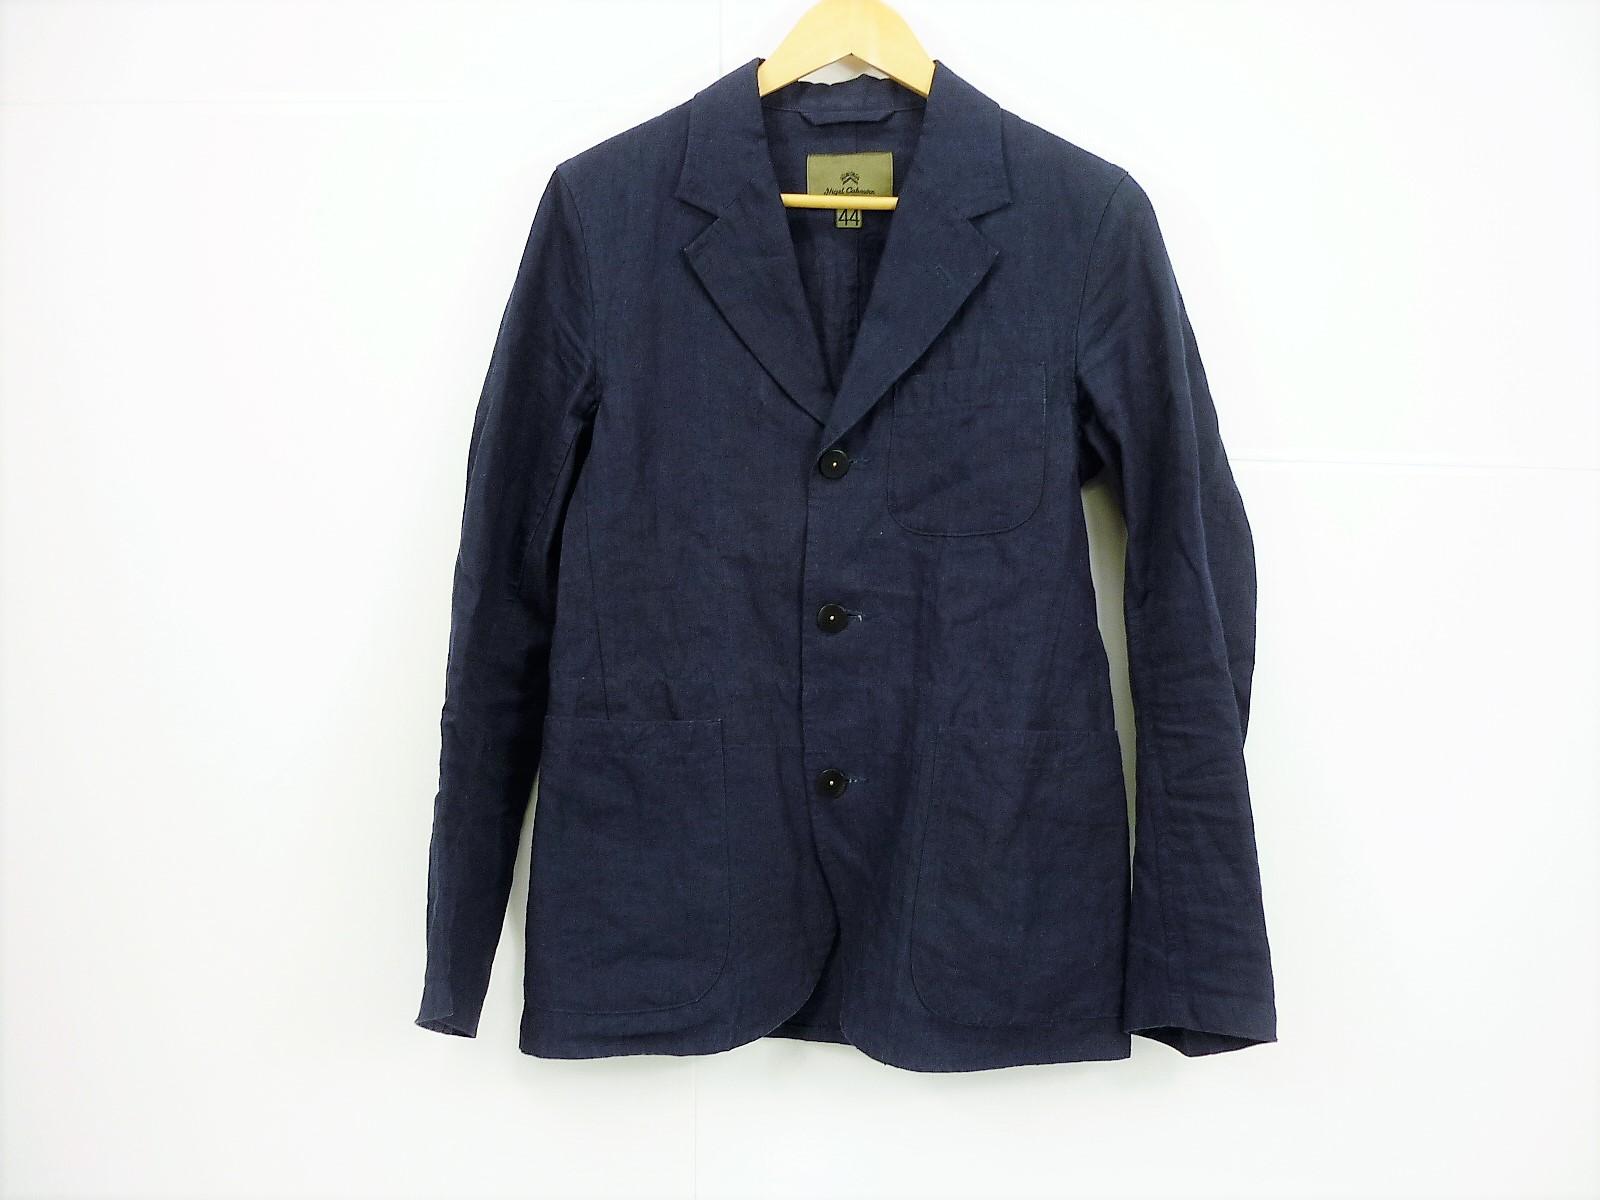 nigel cabourn リネンセットアップスーツ JACKET size:44 PANTS size: 32 ナイジェルケーボン ネイビー